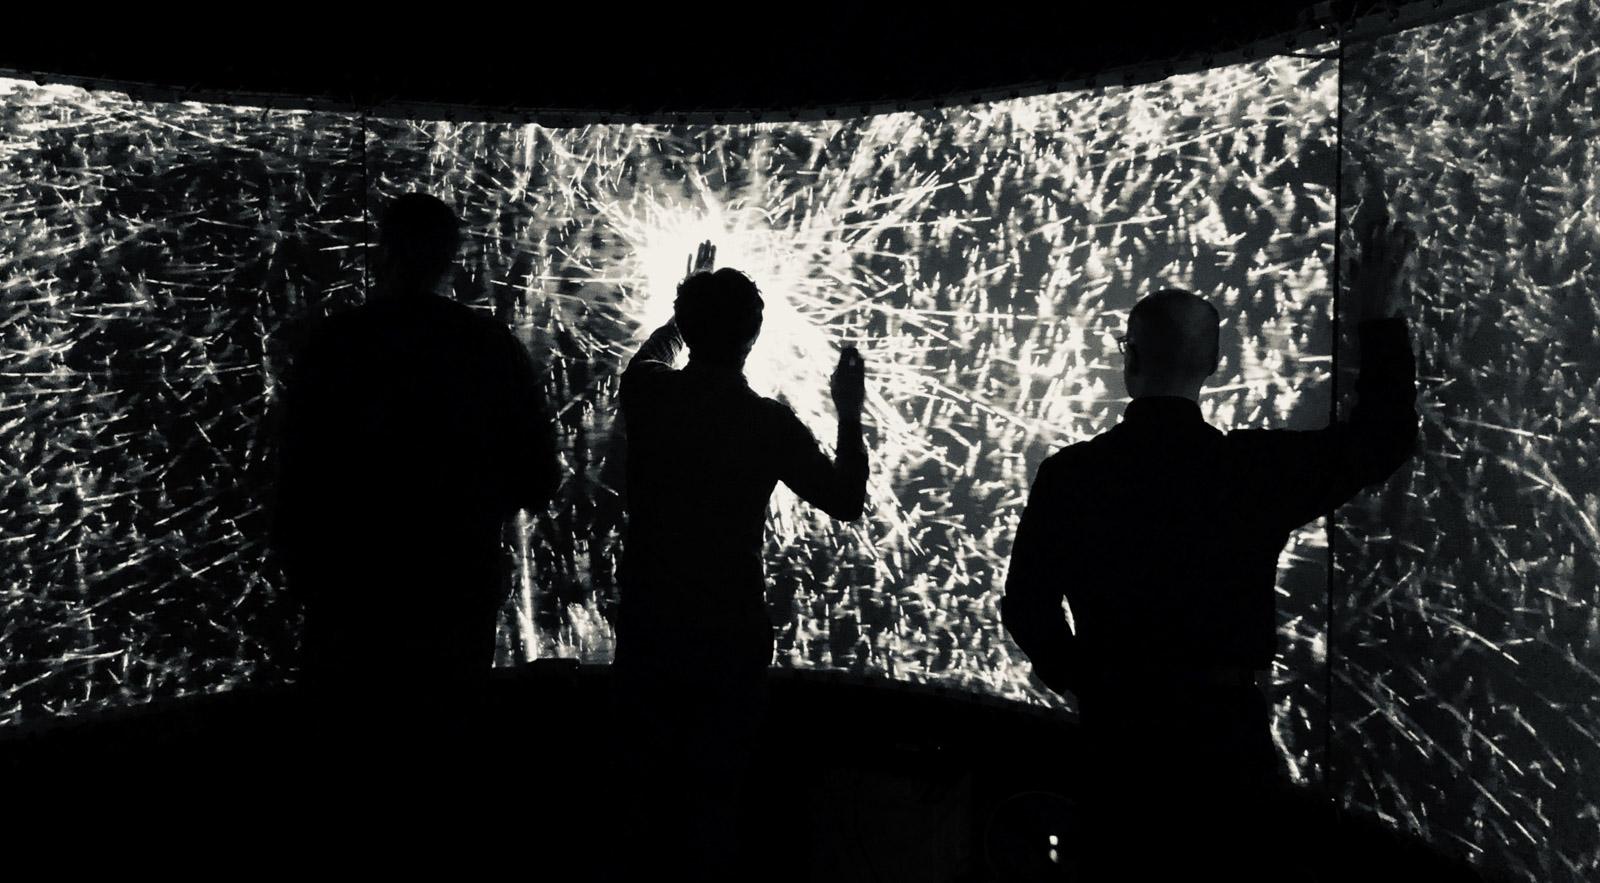 Zeta audio-visual installation artwork